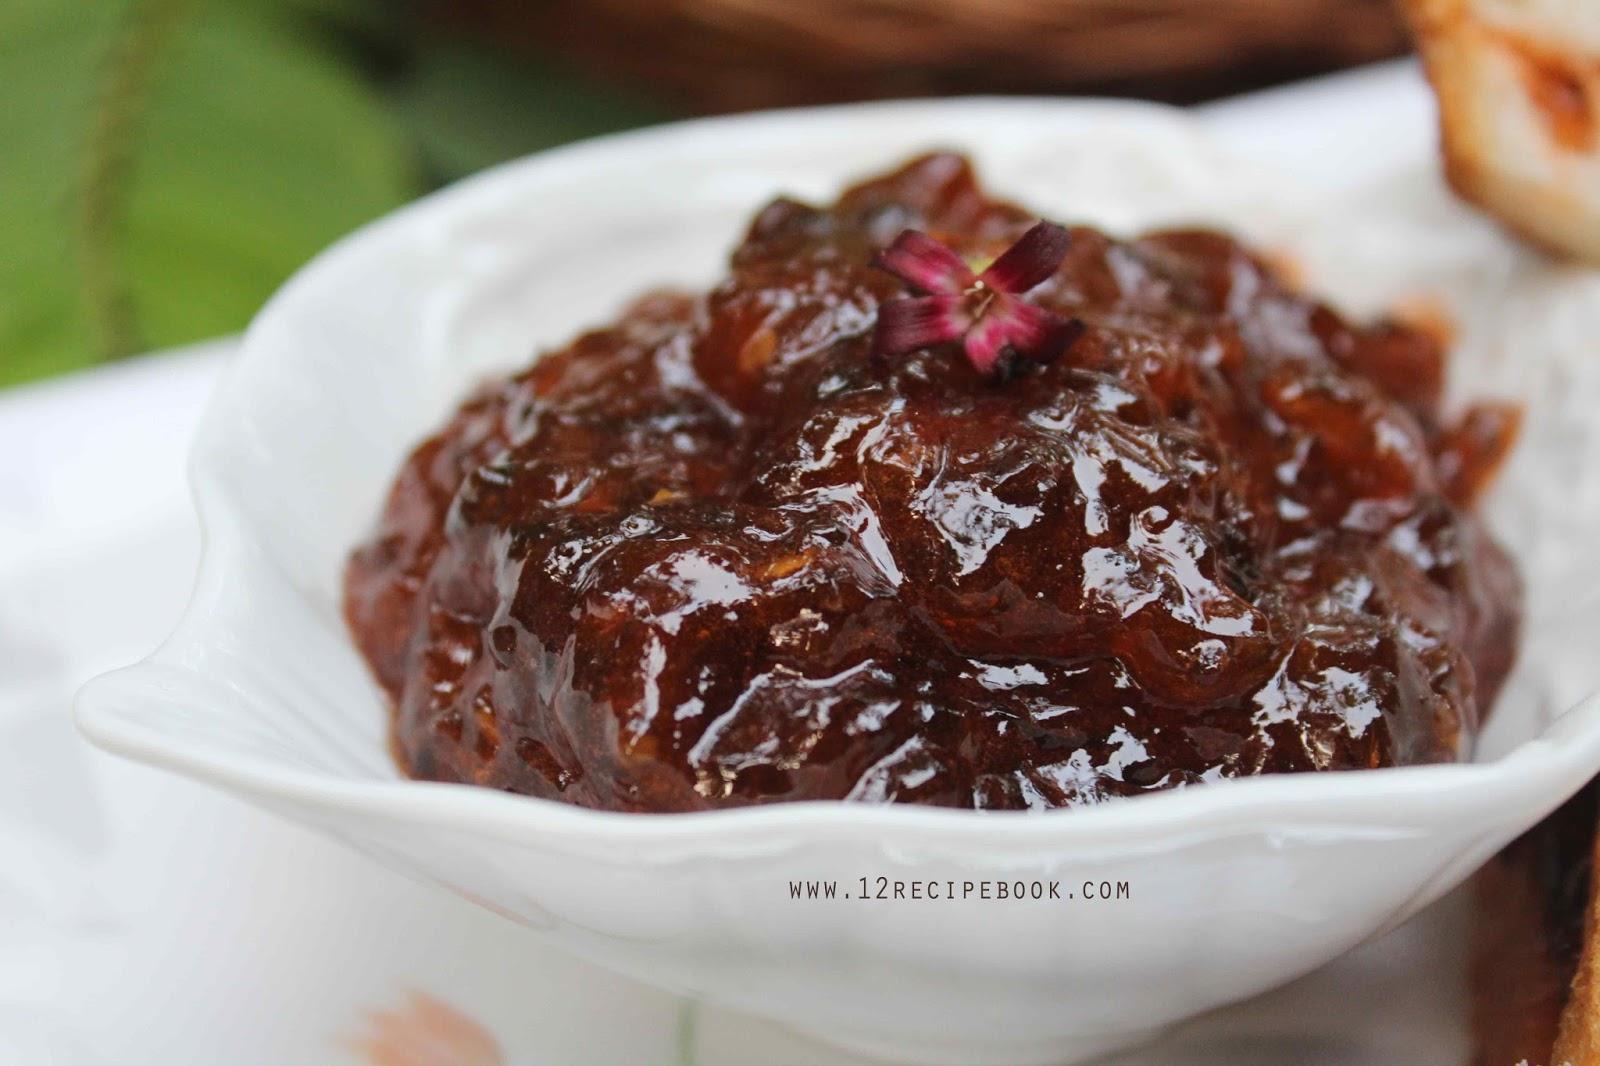 Bilimbi Jam / ഇരുമ്പൻപുളി ജാം